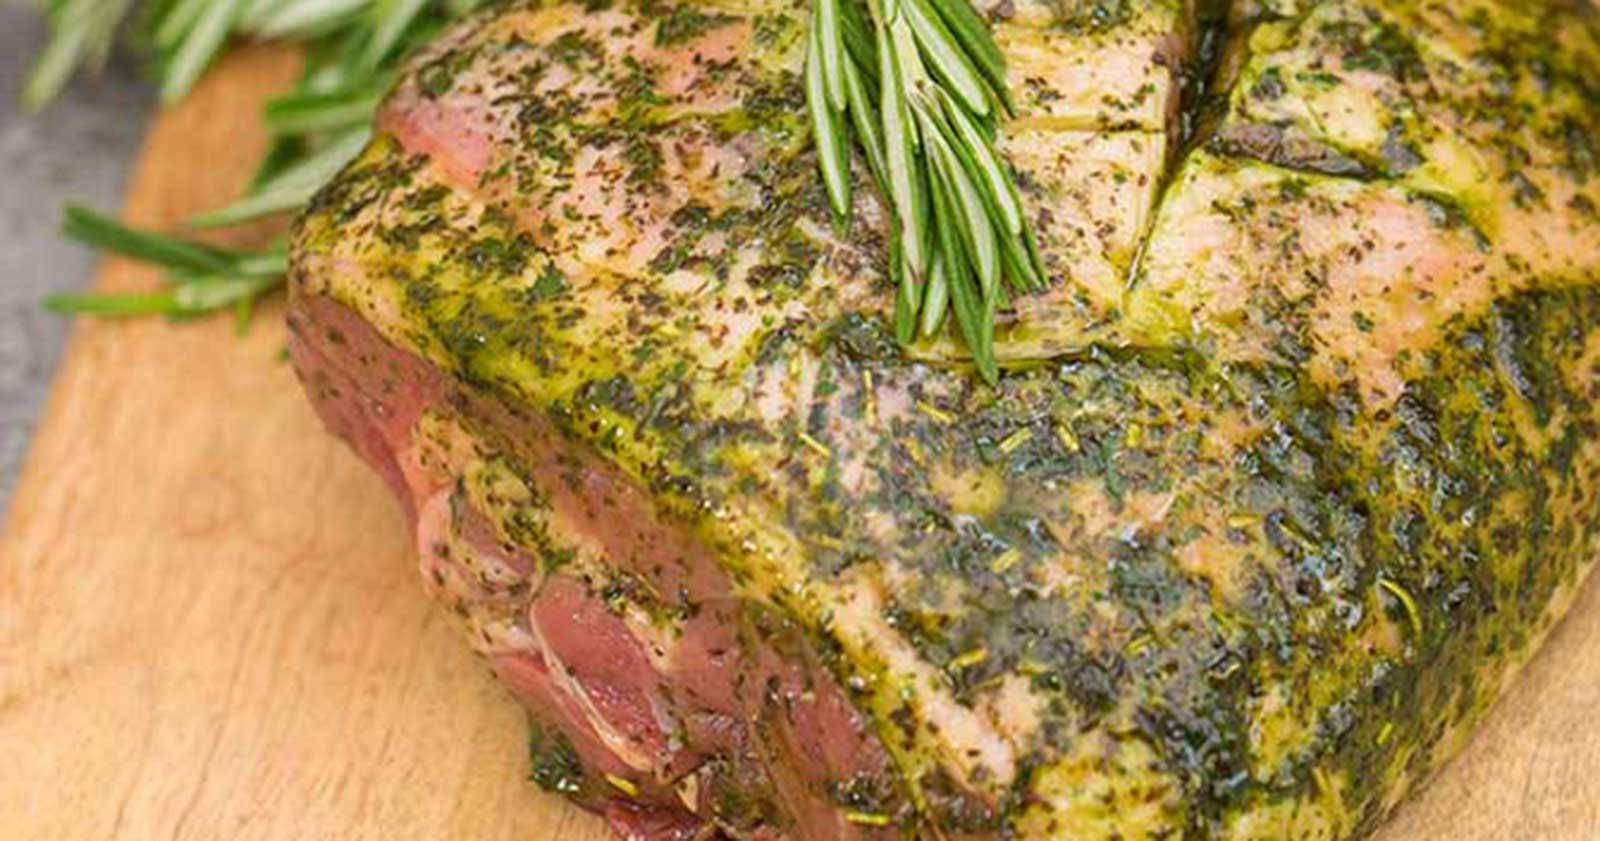 Grasmere Farm - Award winning Lincolnshire farm, butchers & online store